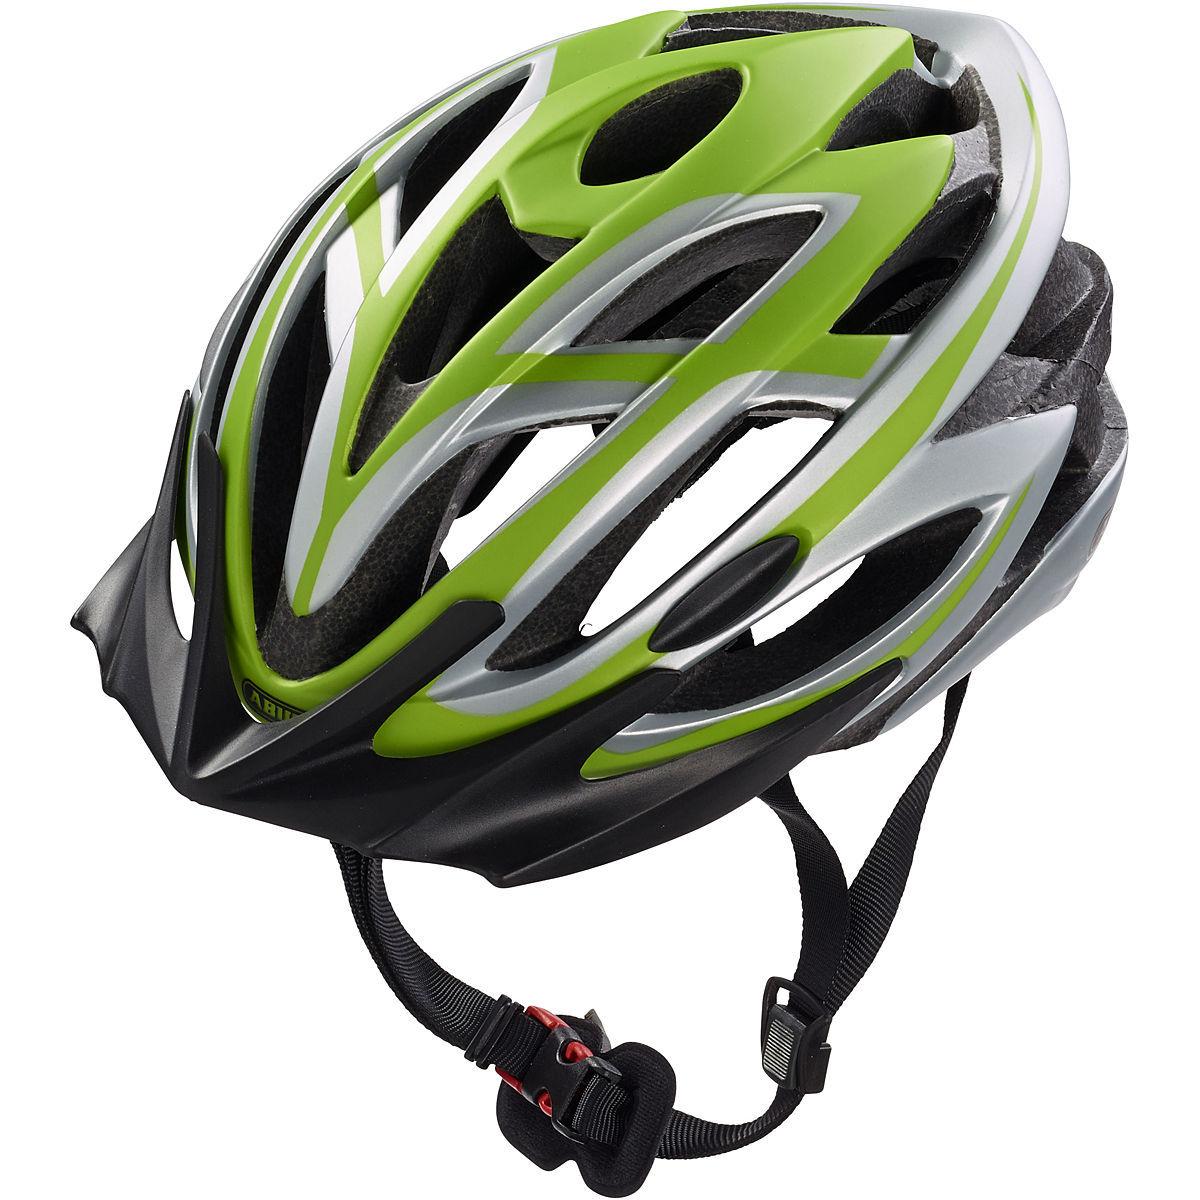 "ABUS™ - Fahrradhelm ""S-Force Peak (Race Green)"" (58-62cm) ab €19,33 [@Karstadt.de]"